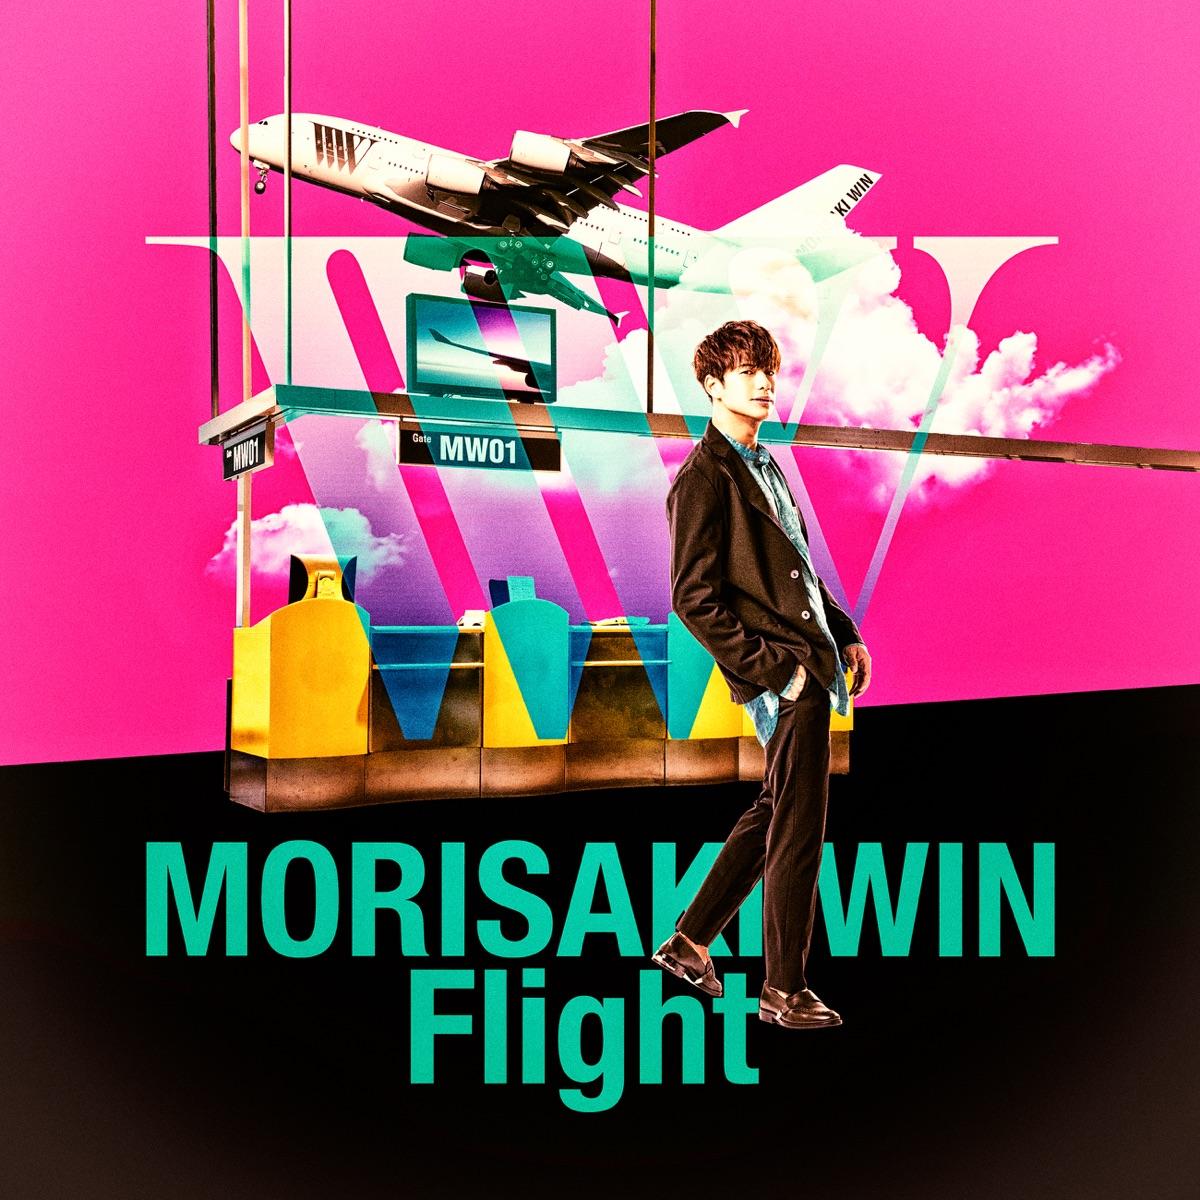 『MORISAKI WIN - Fly with me』収録の『Flight』ジャケット